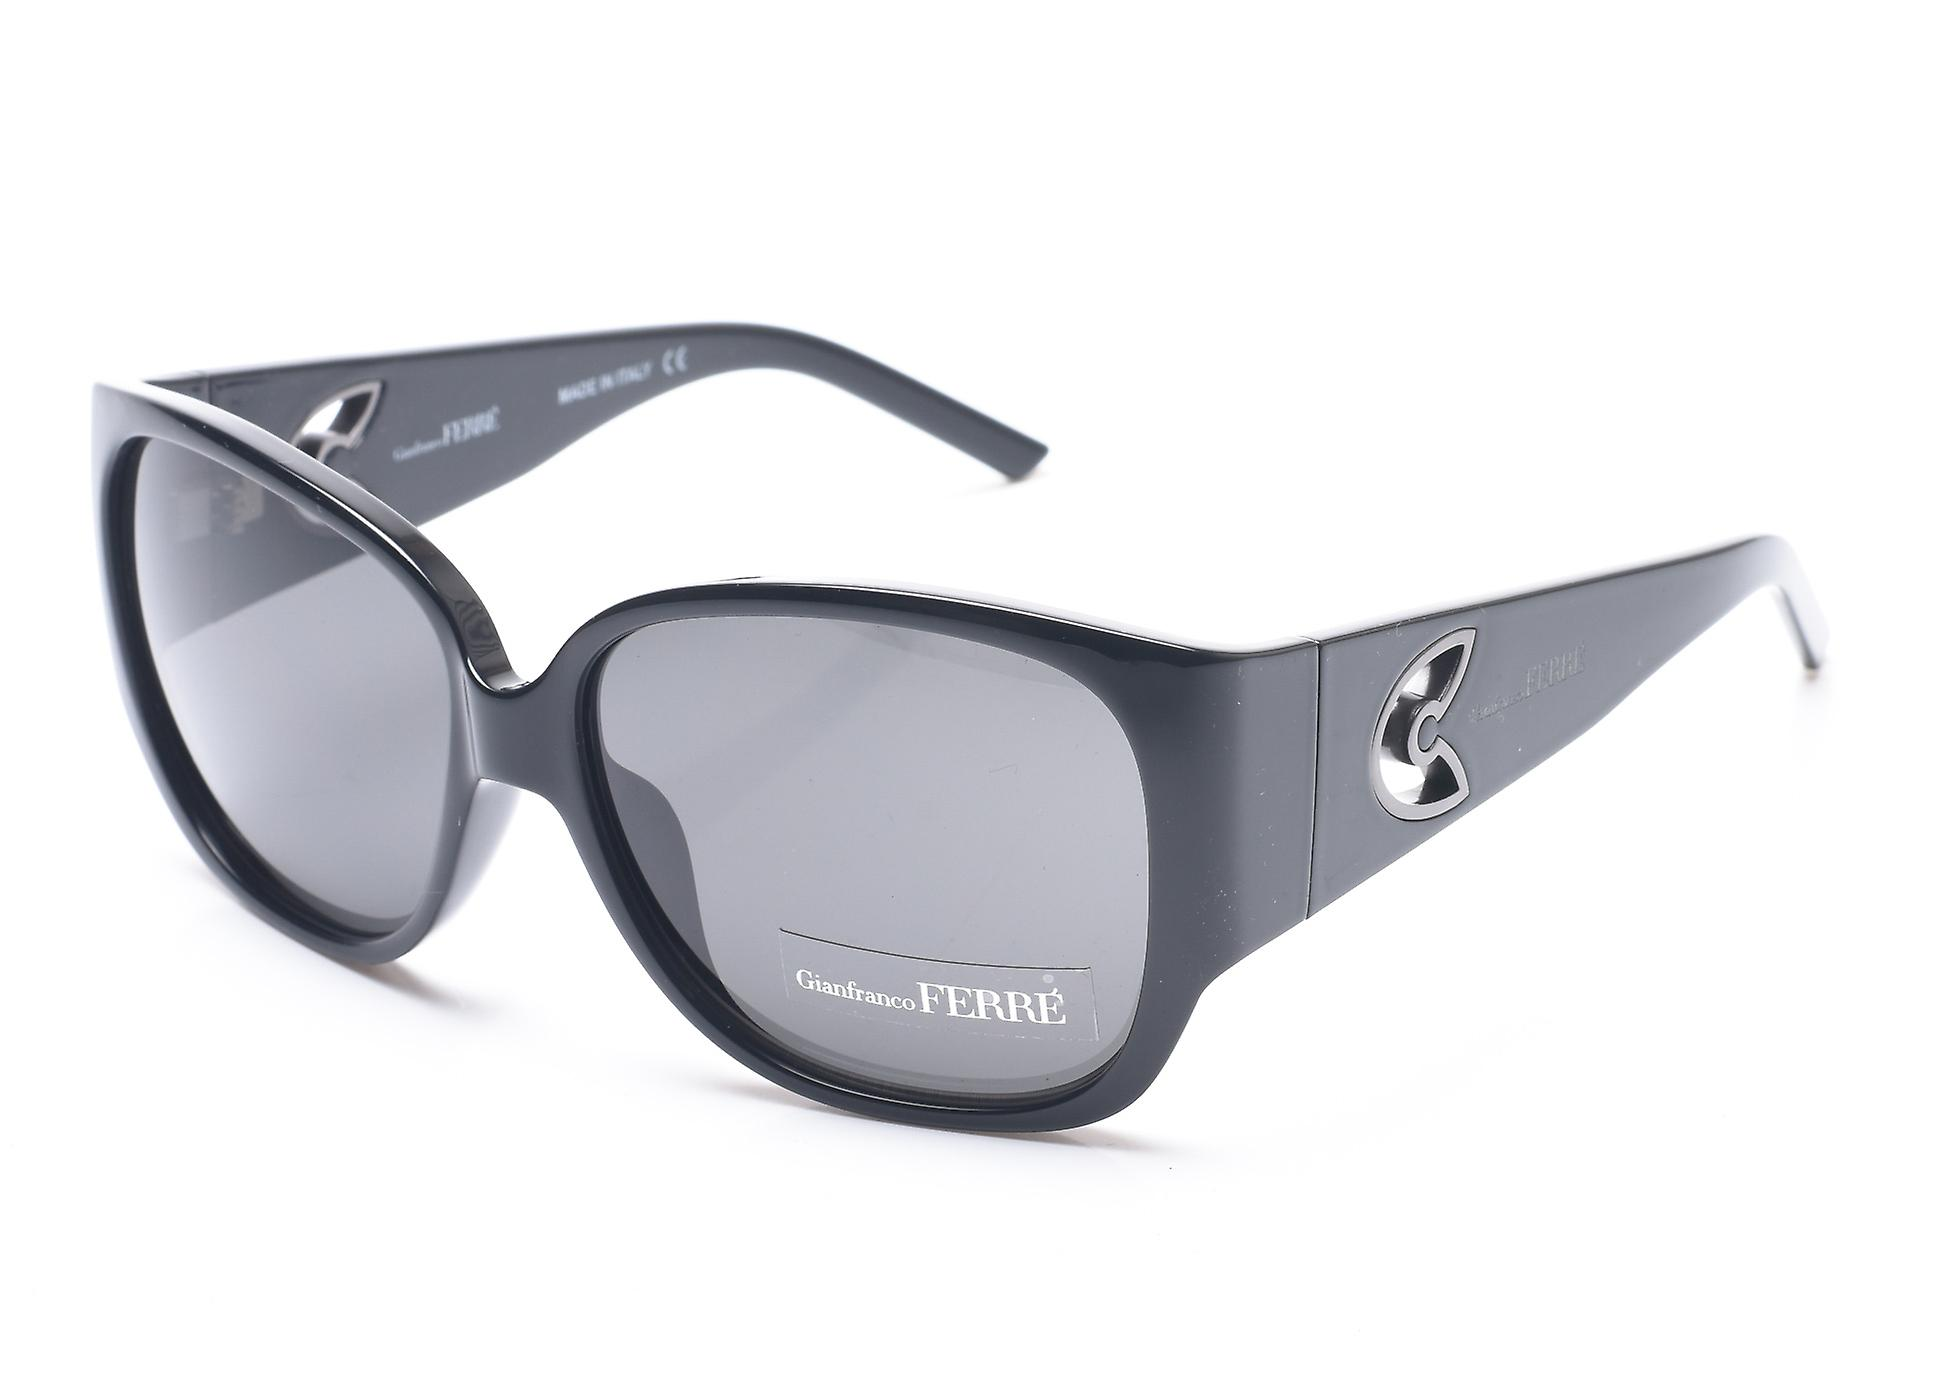 8c185349273 Gianfranco Ferre Women s Rounded Square Sunglasses Black Silver